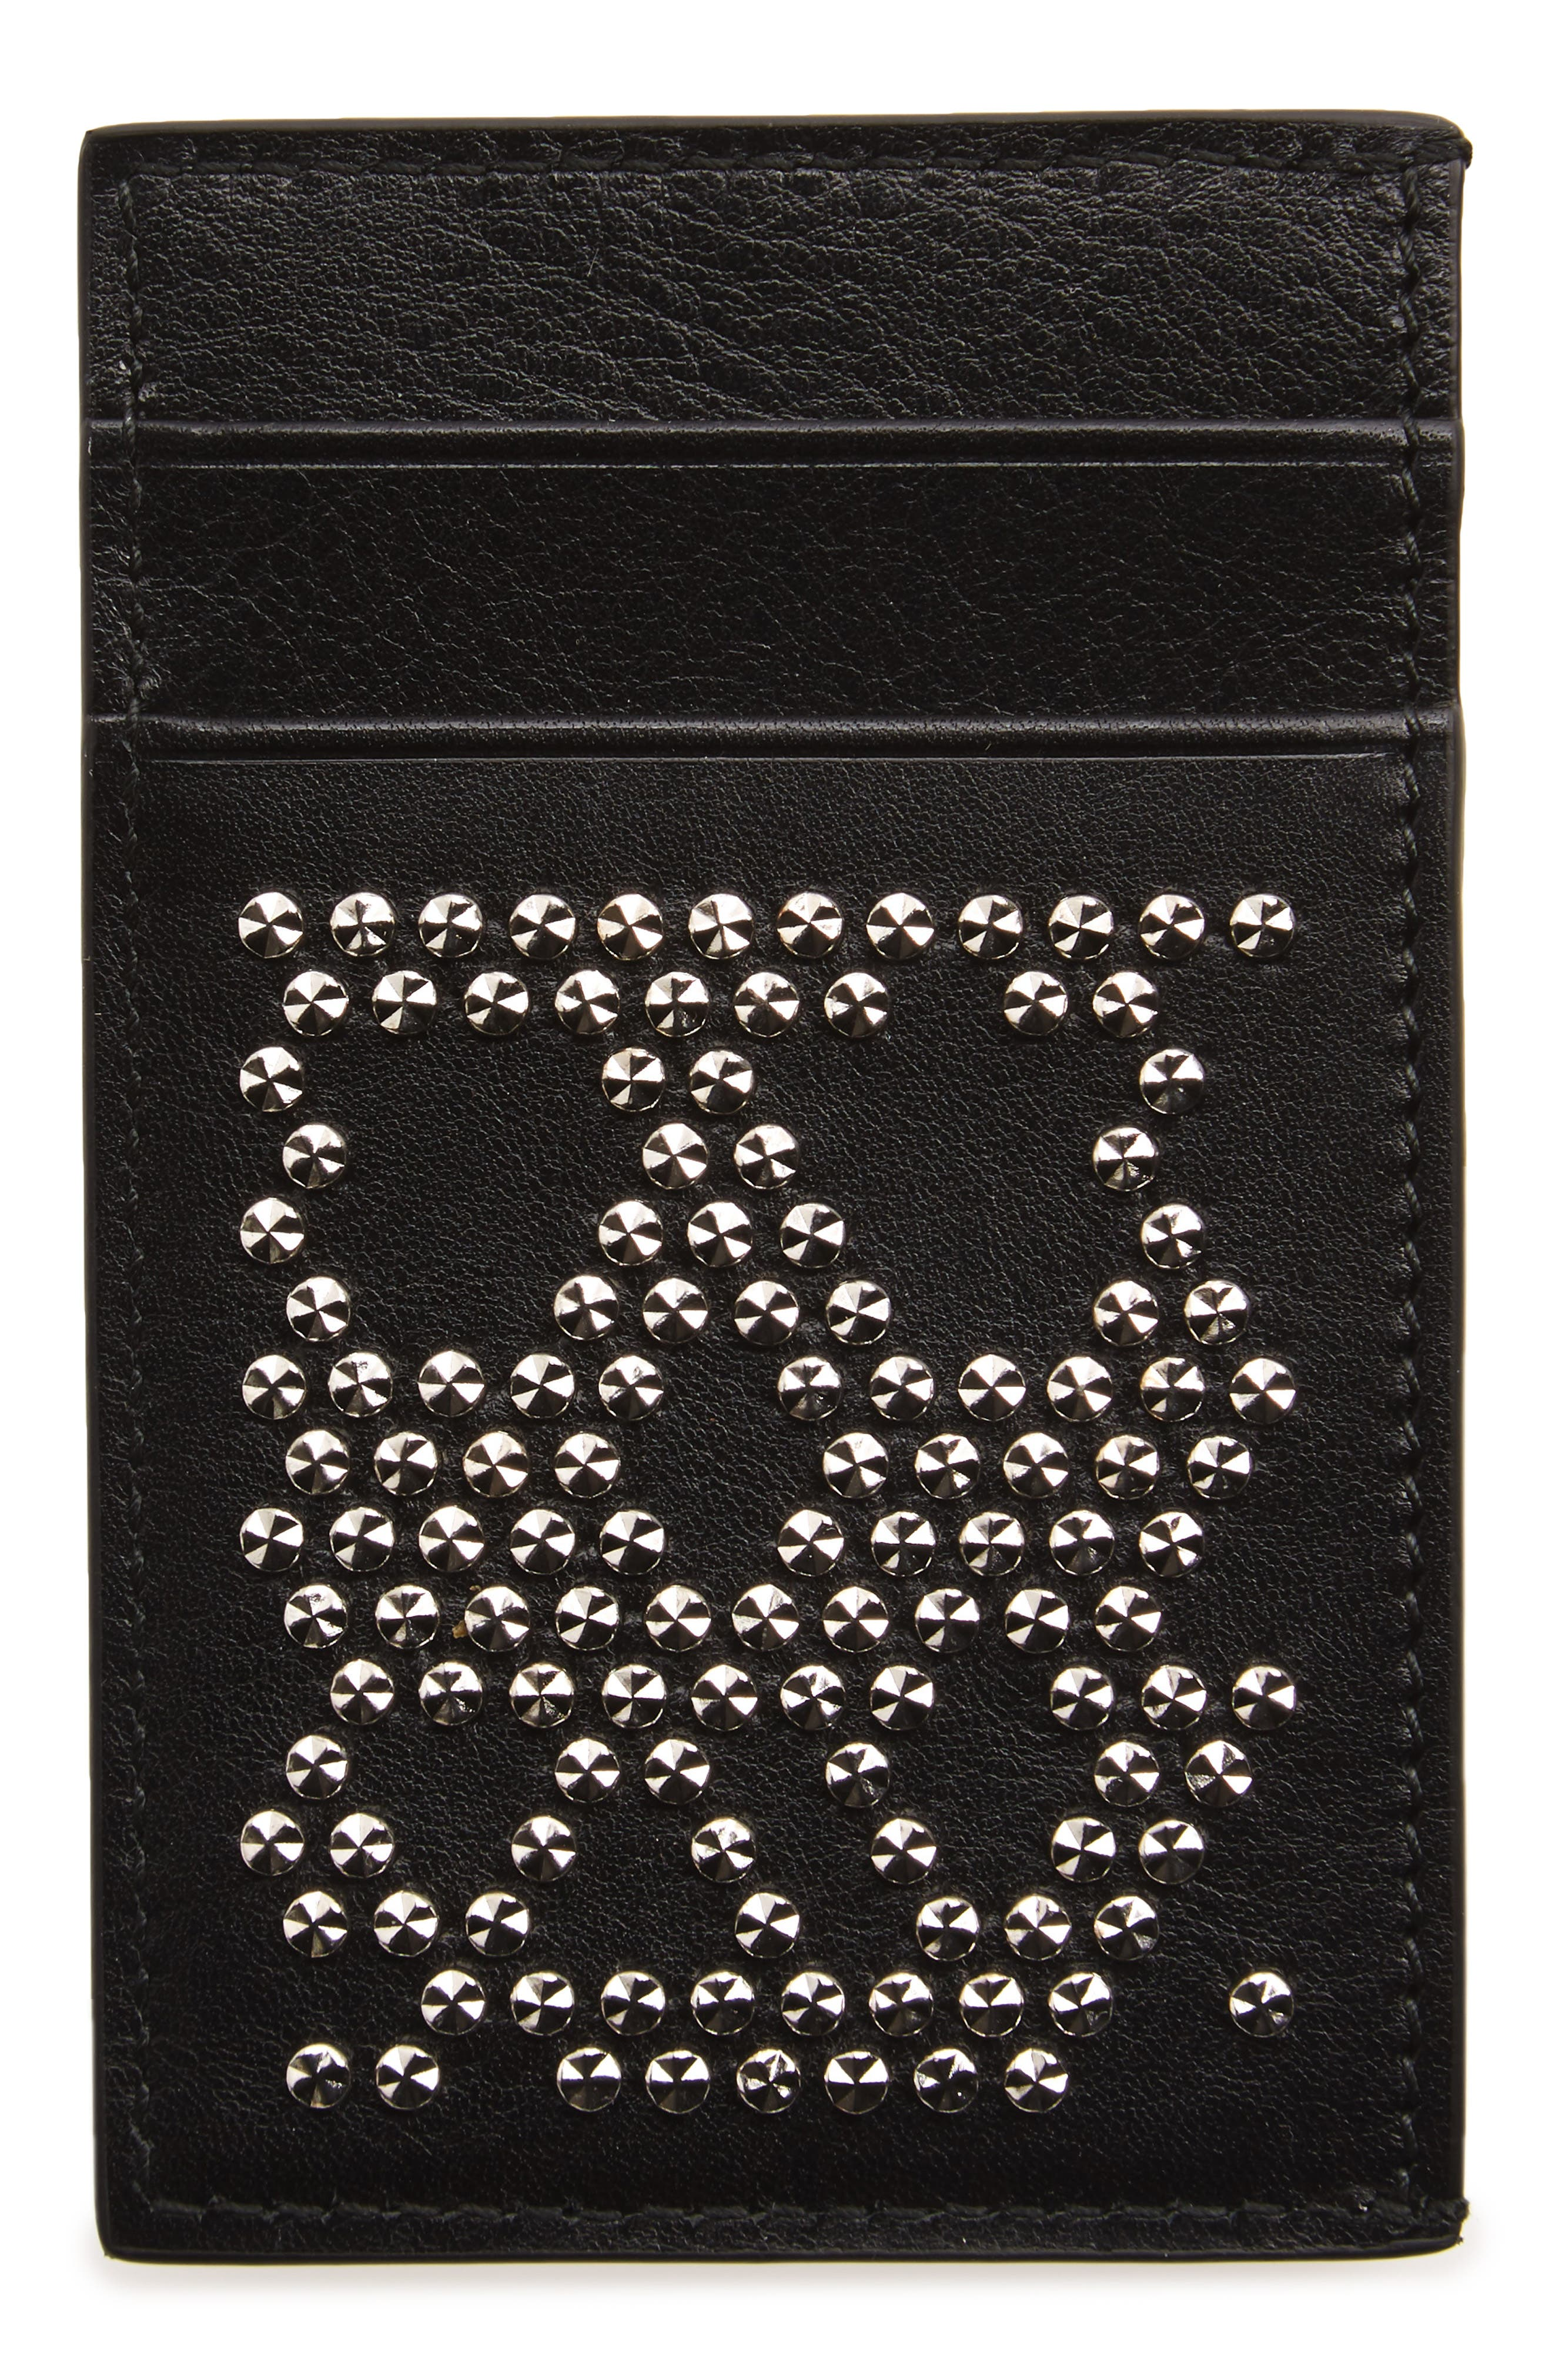 Stud Skull Leather Card Case,                             Alternate thumbnail 2, color,